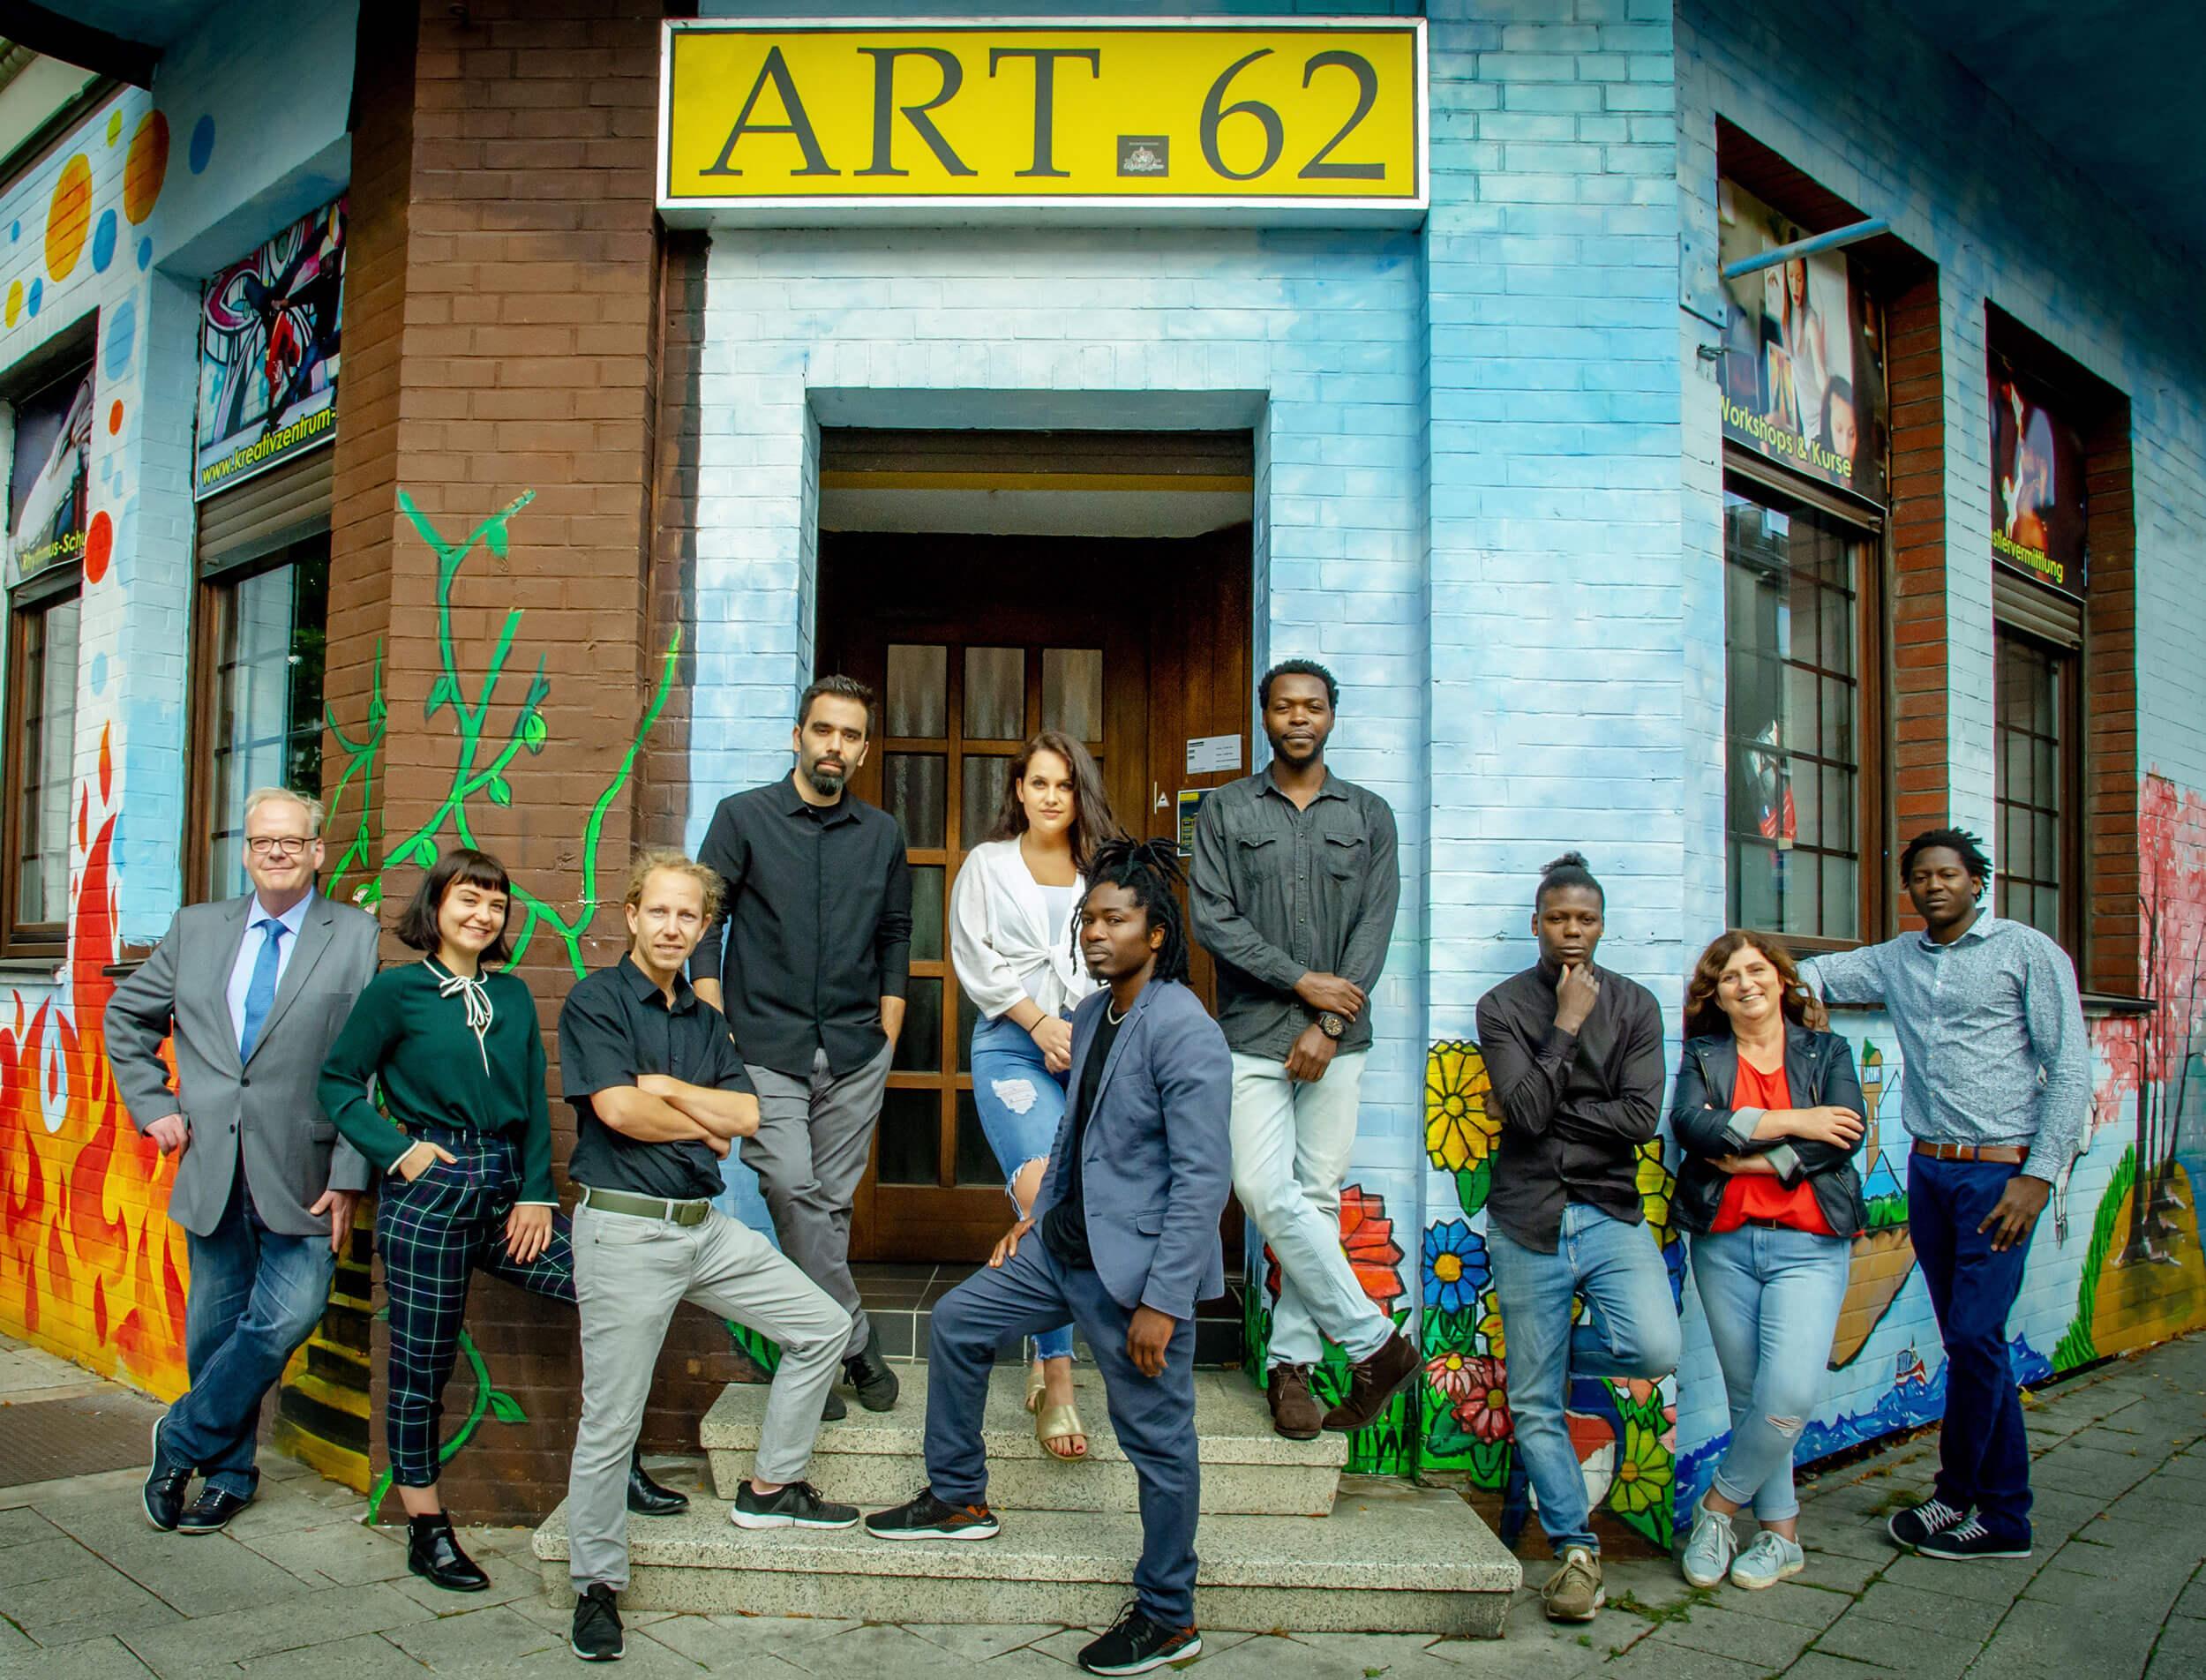 Team des Kreativzentrums Vest